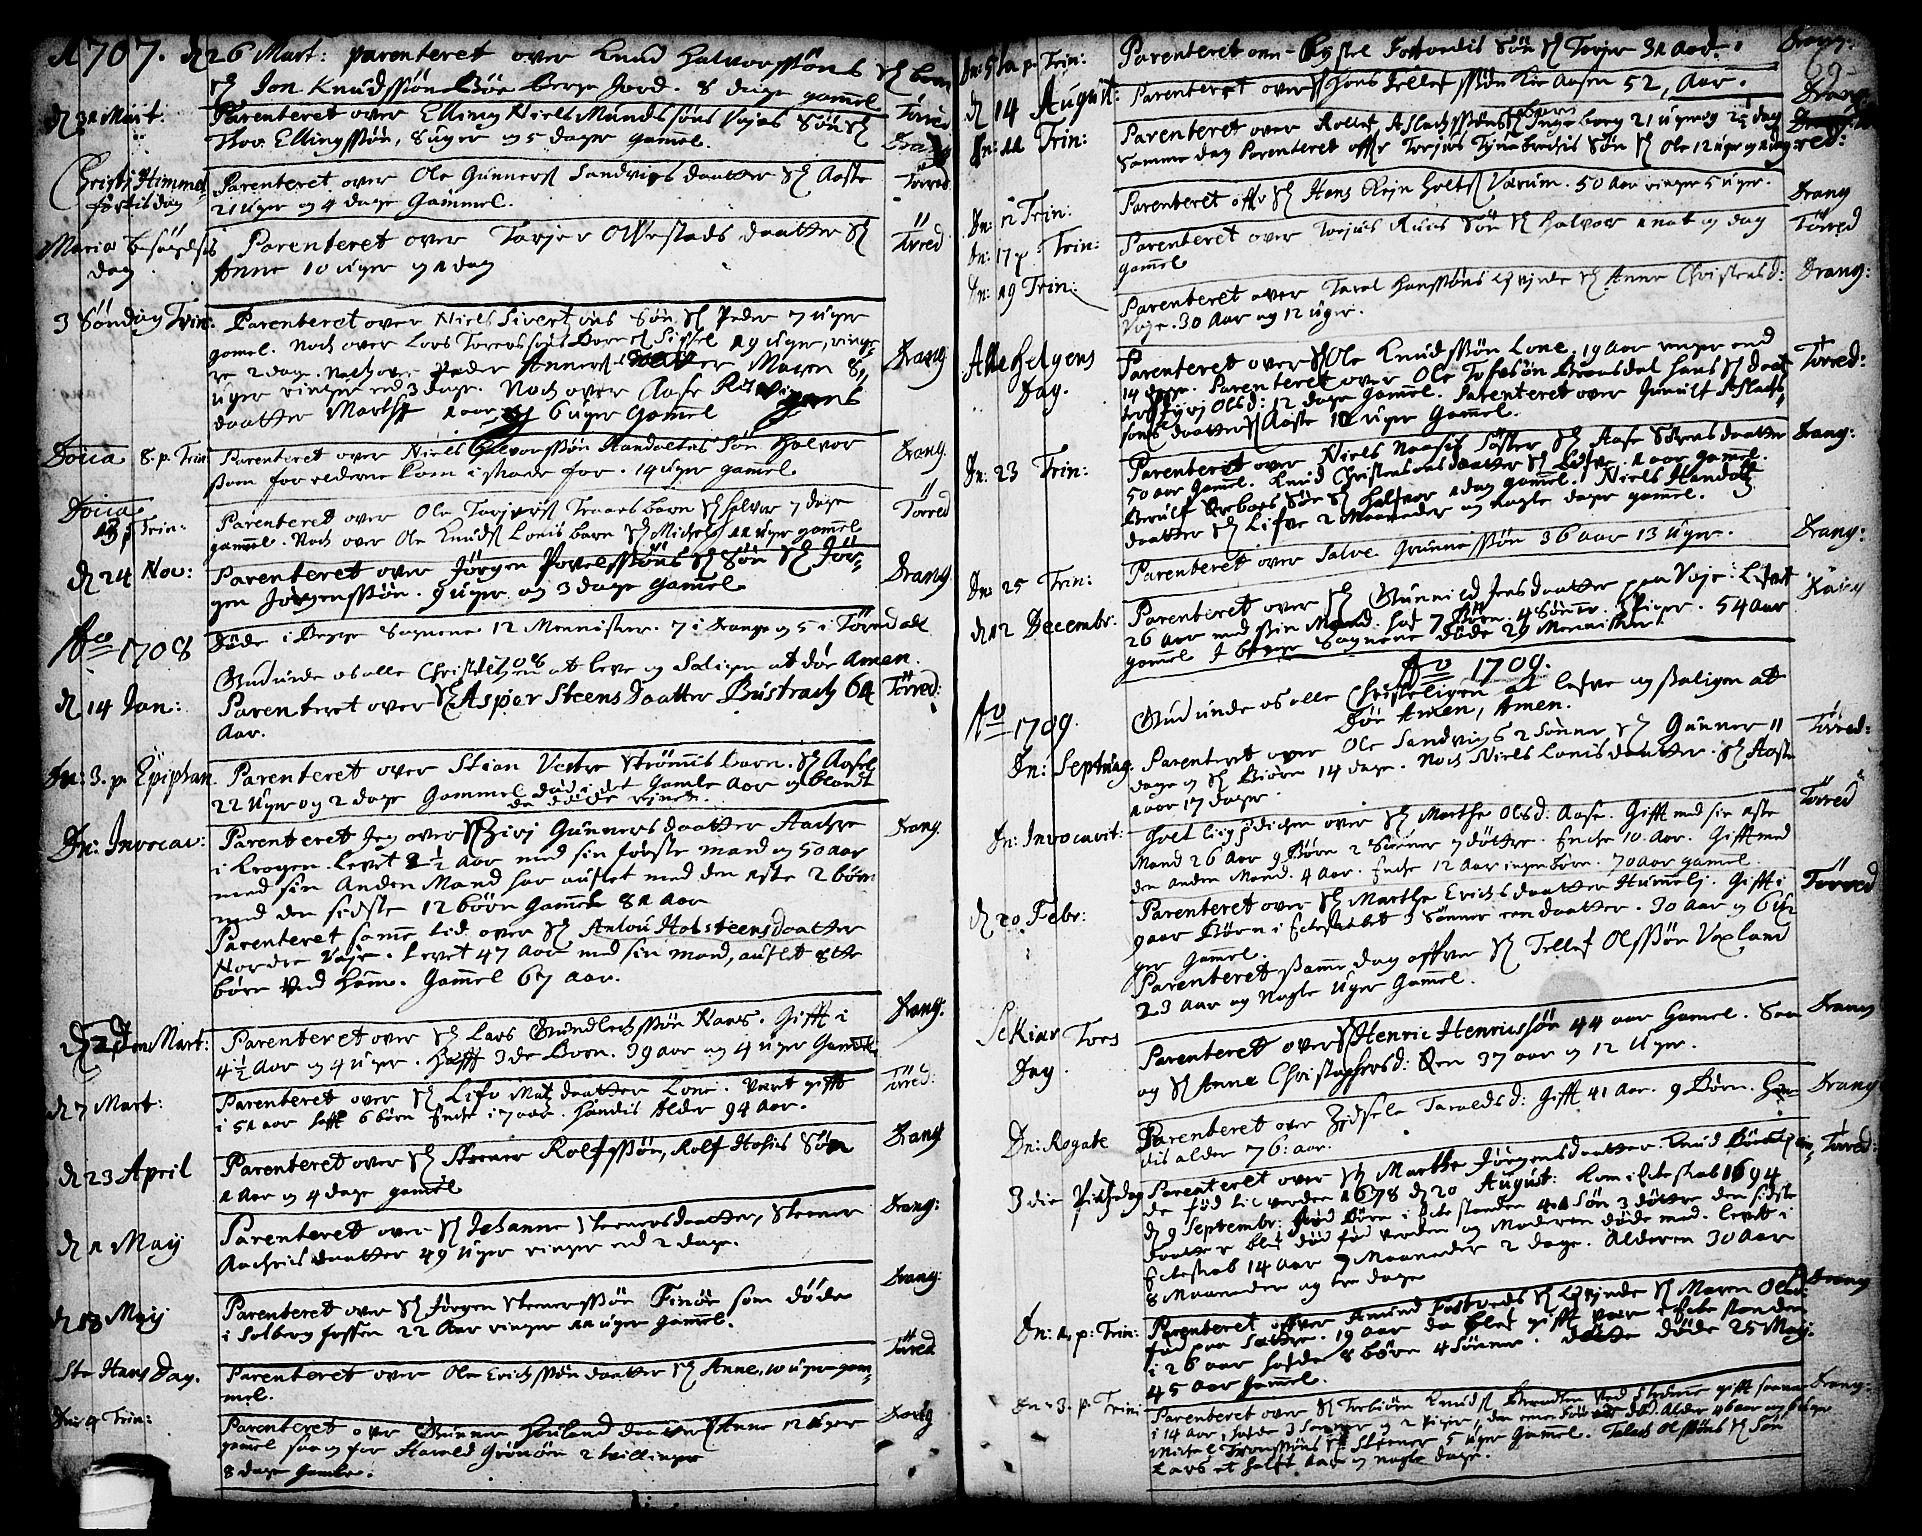 SAKO, Drangedal kirkebøker, F/Fa/L0001: Ministerialbok nr. 1, 1697-1767, s. 69